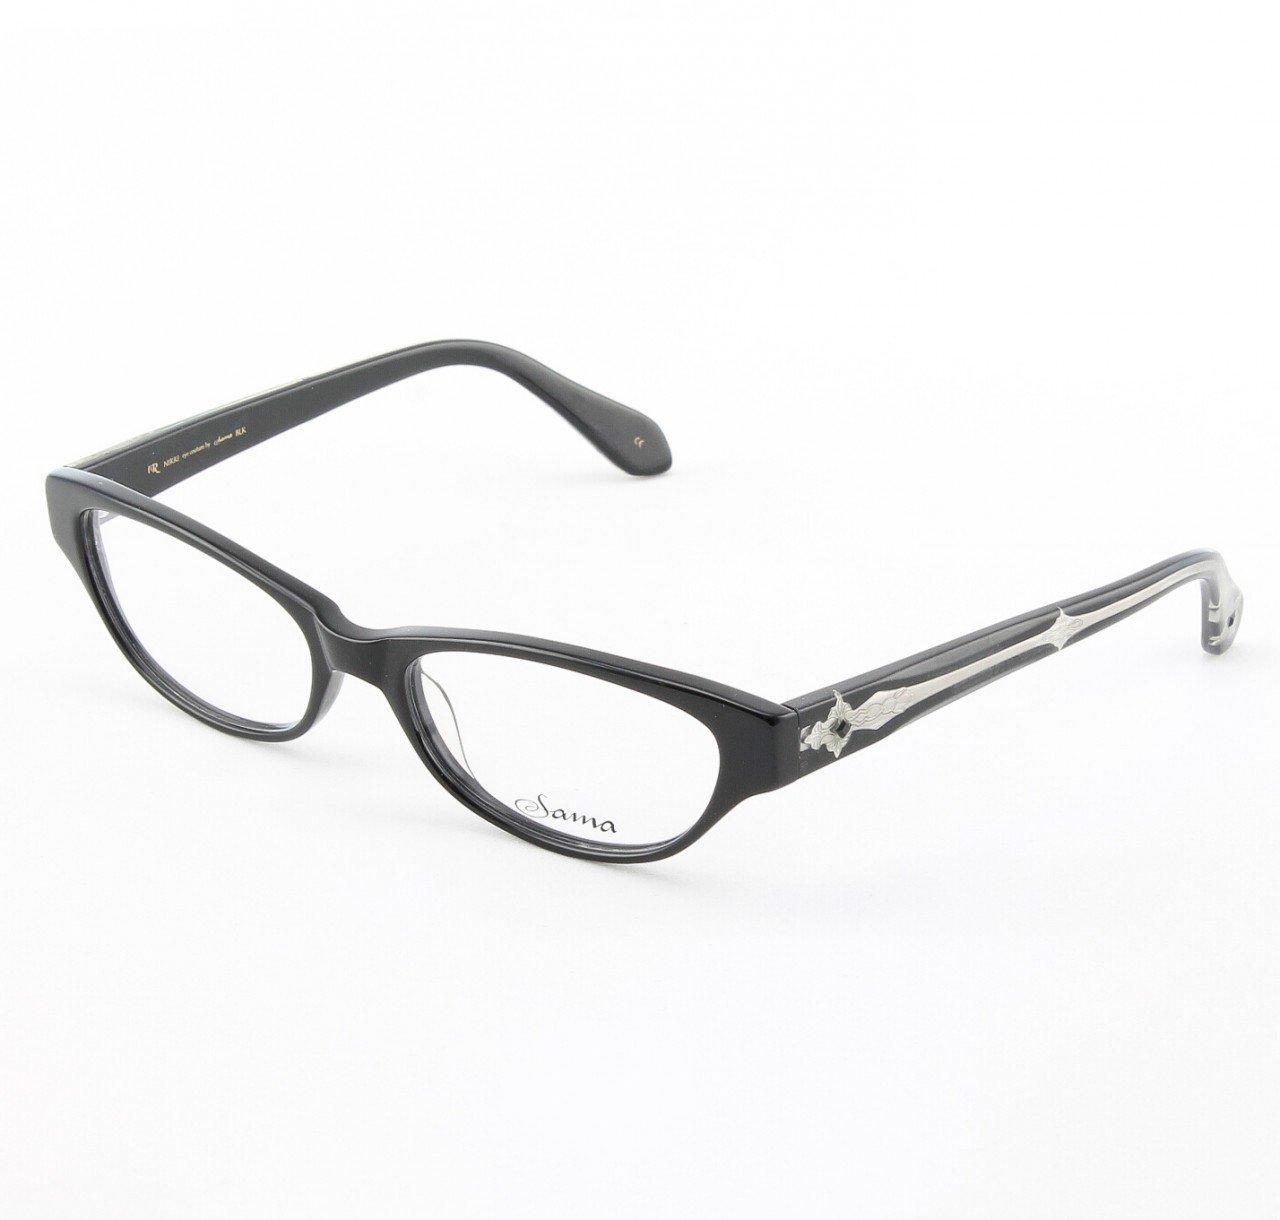 Loree Rodkin Nikki Eyeglasses Black w/ Clear Lenses, Swarovski Crystals and Decorative Temple Core